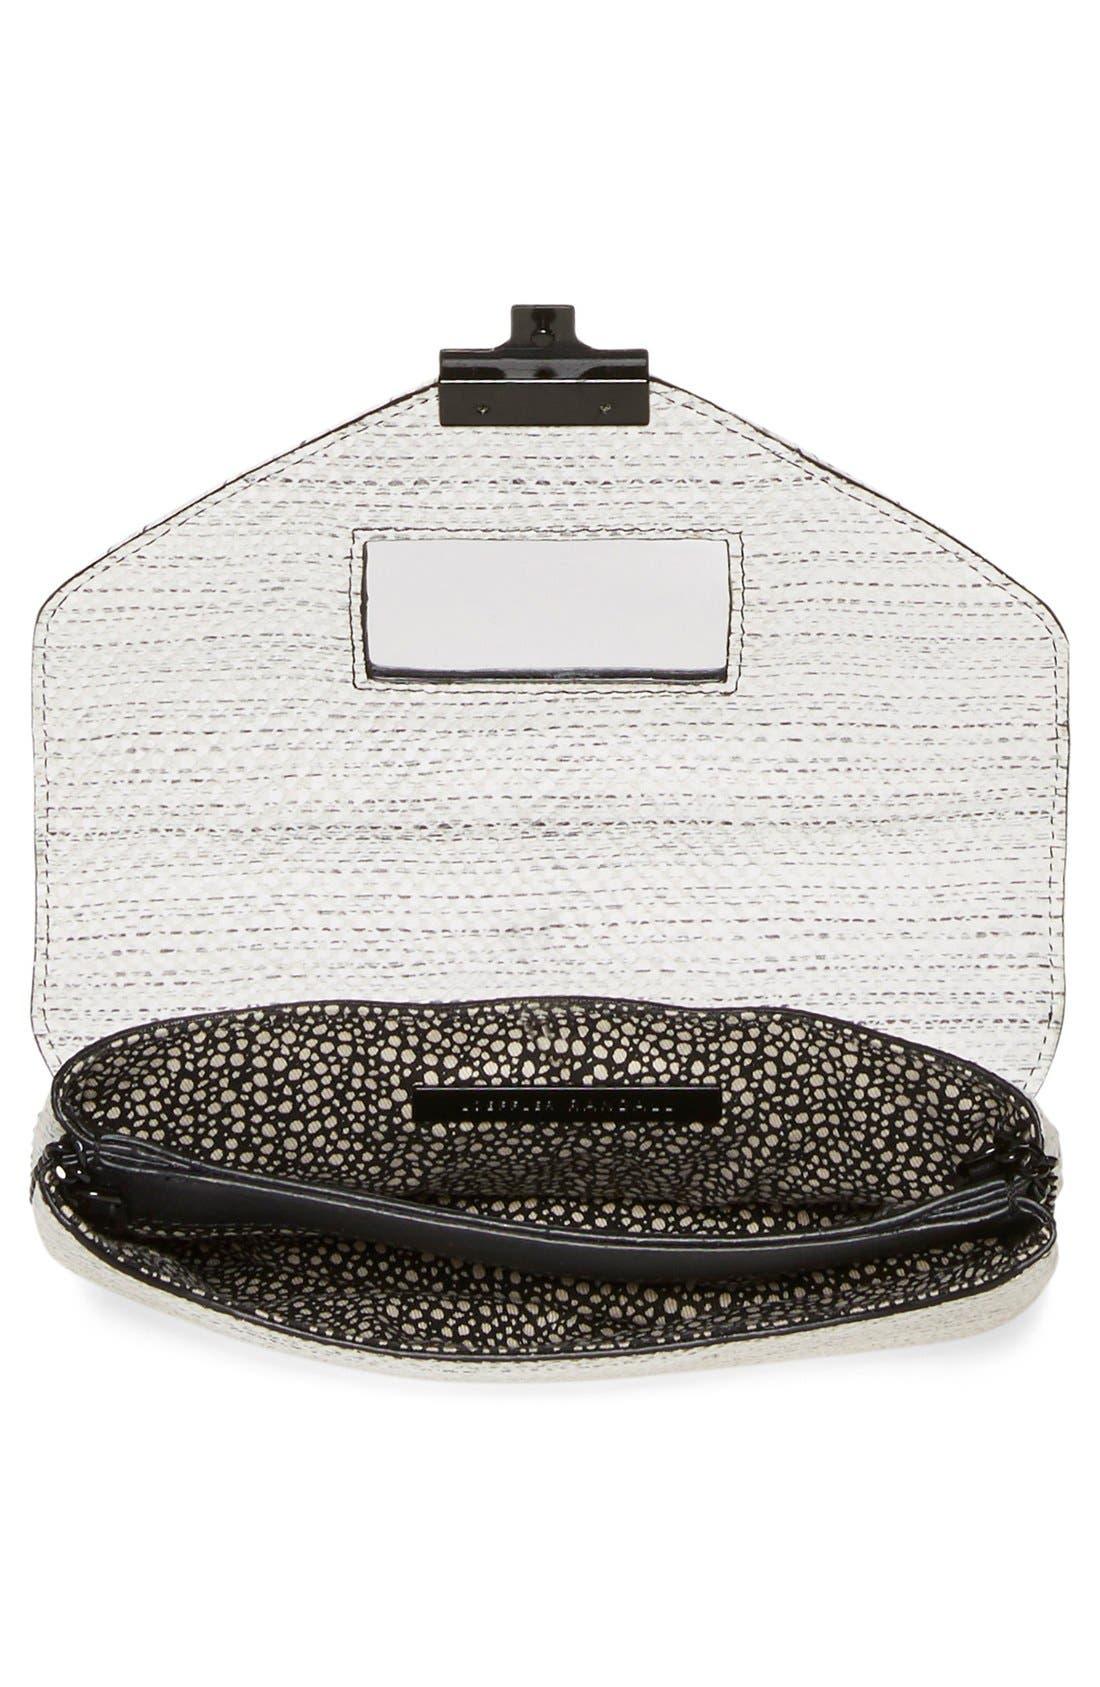 'Junior Lock' Leather Envelope Clutch,                             Alternate thumbnail 4, color,                             White Black